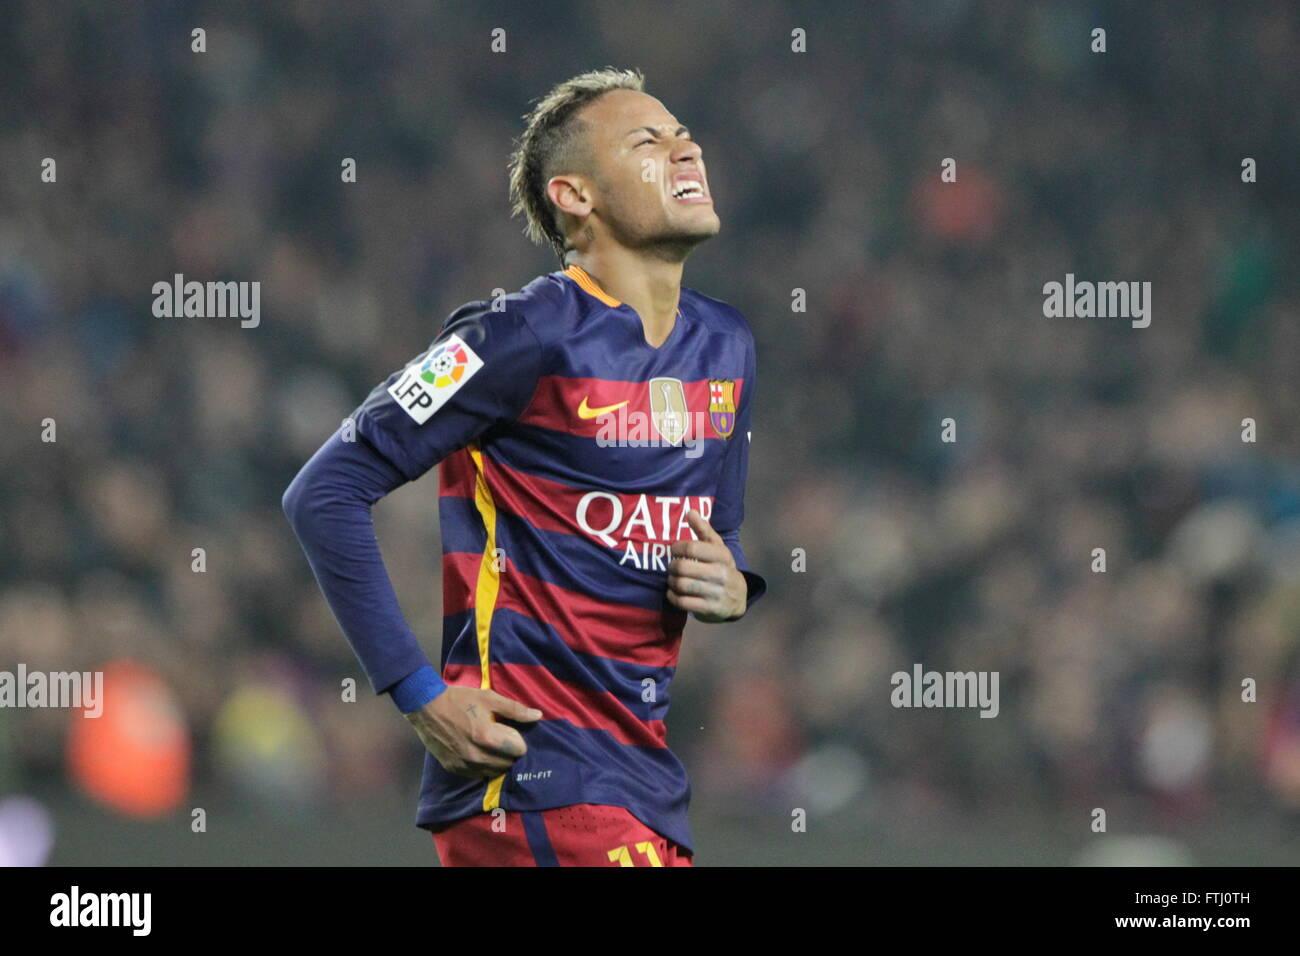 Barcelona, Spain, January 27, 2016: King Cup Neymar jr actio during the match between FC Barcelona - Atlético - Stock Image